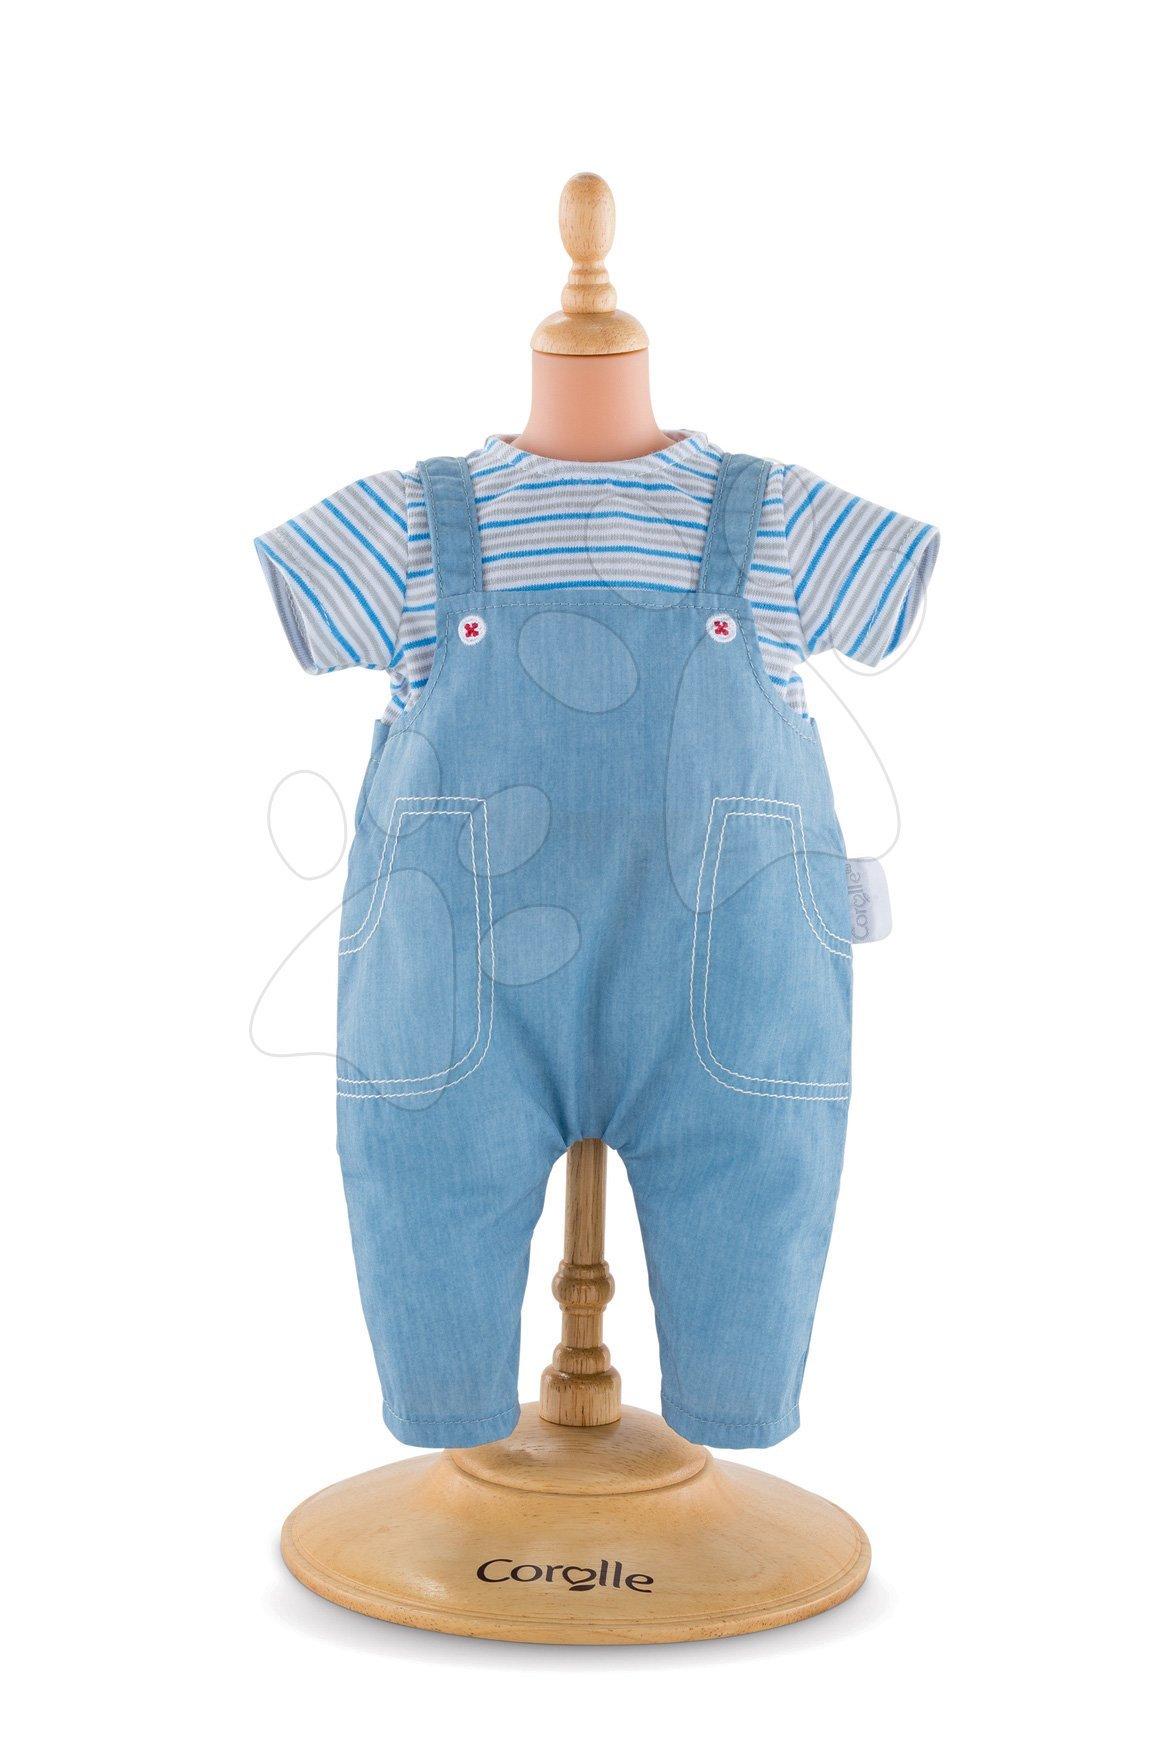 Oblečenie Striped T-shirt & Overall Mon Grand Poupon Corolle pre 36 cm bábiku od 24 mes